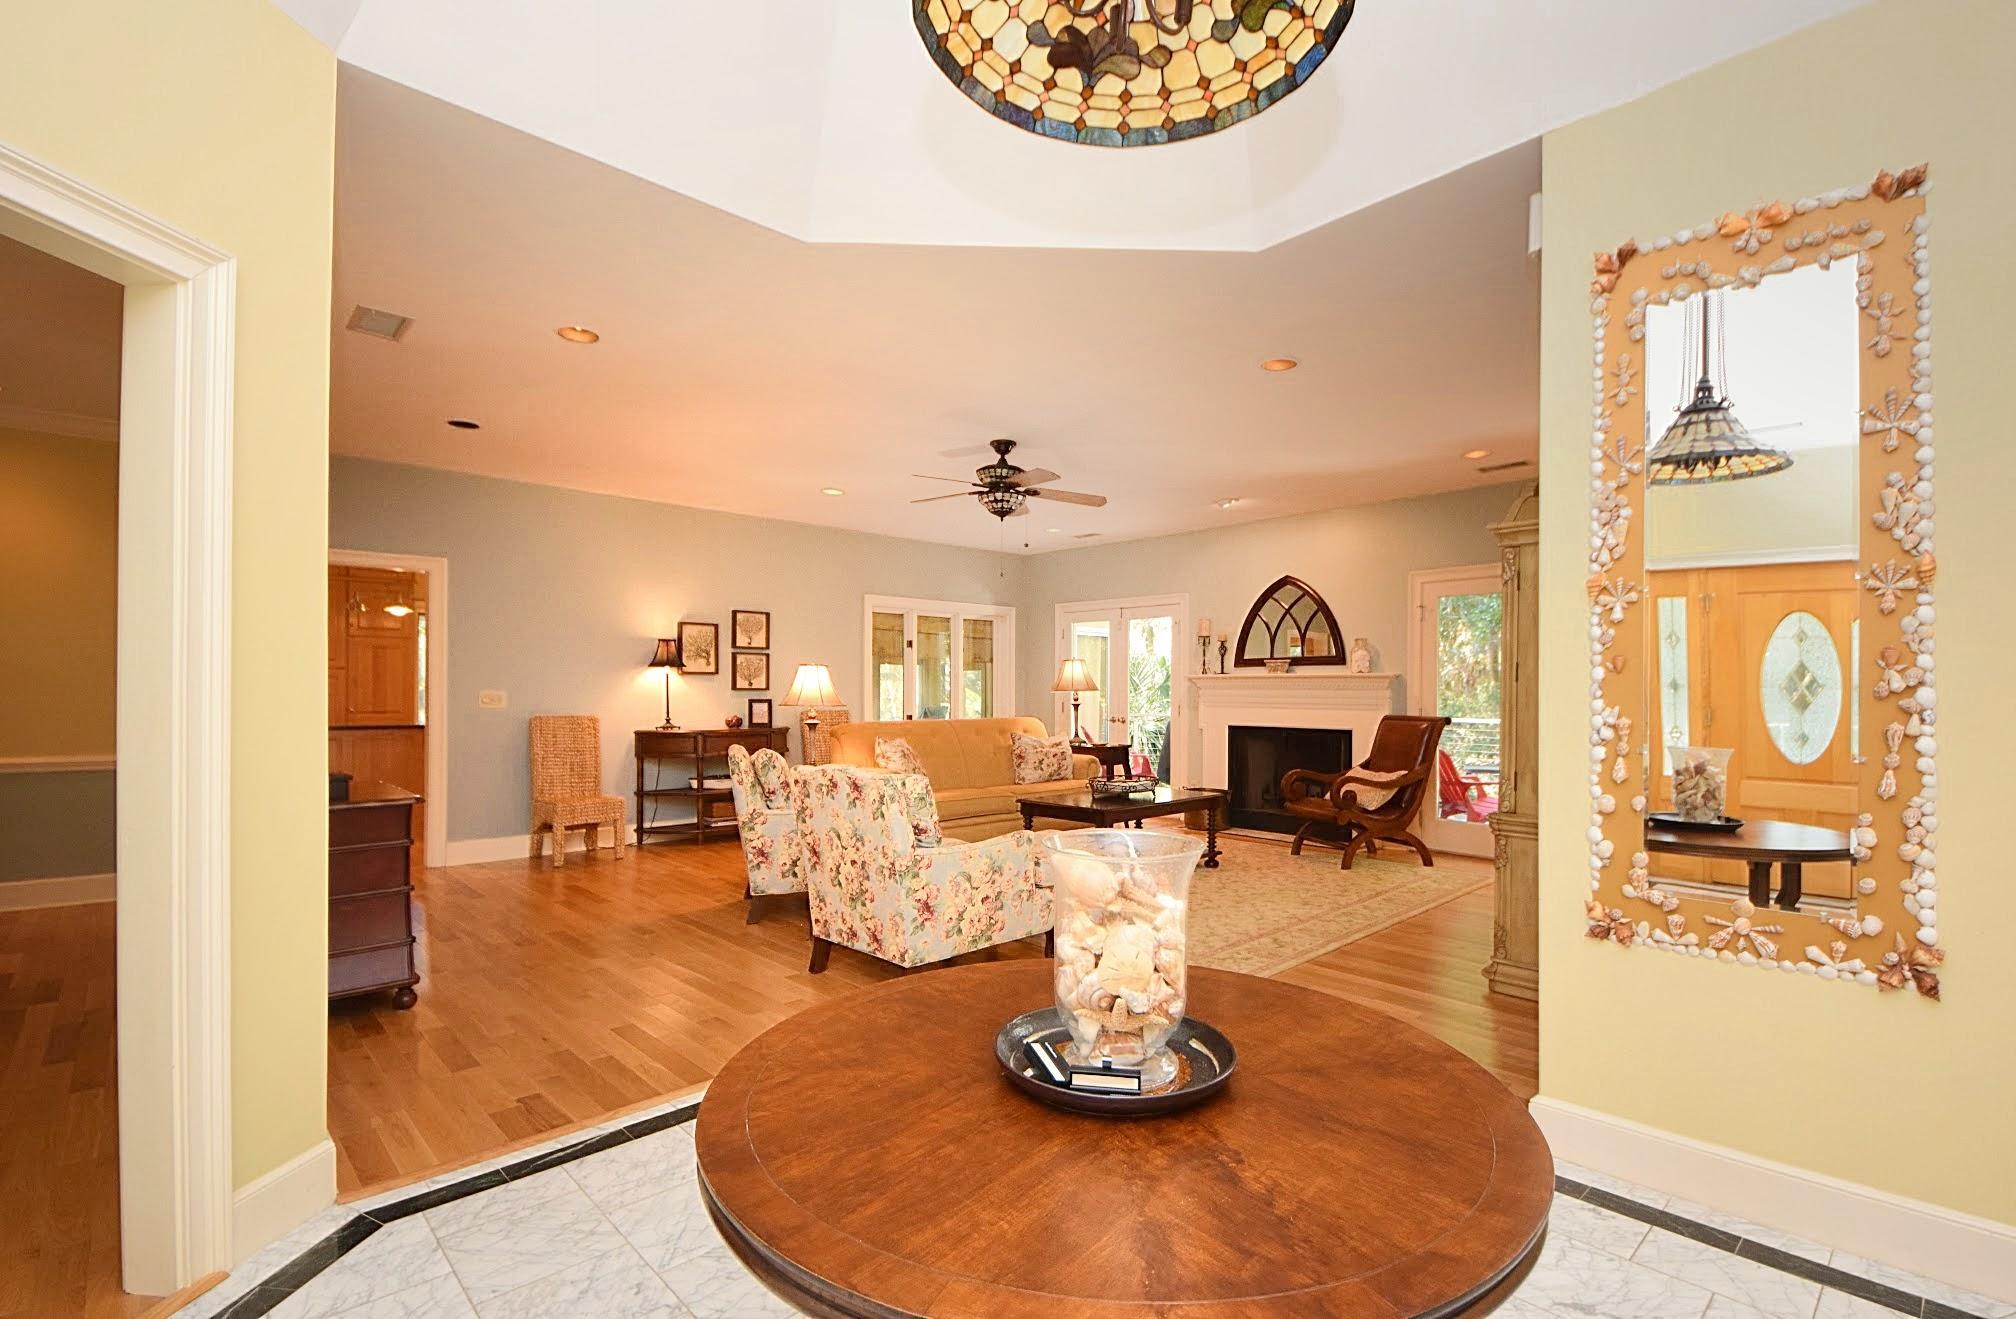 Kiawah Island Homes For Sale - 132 Governors, Kiawah Island, SC - 7